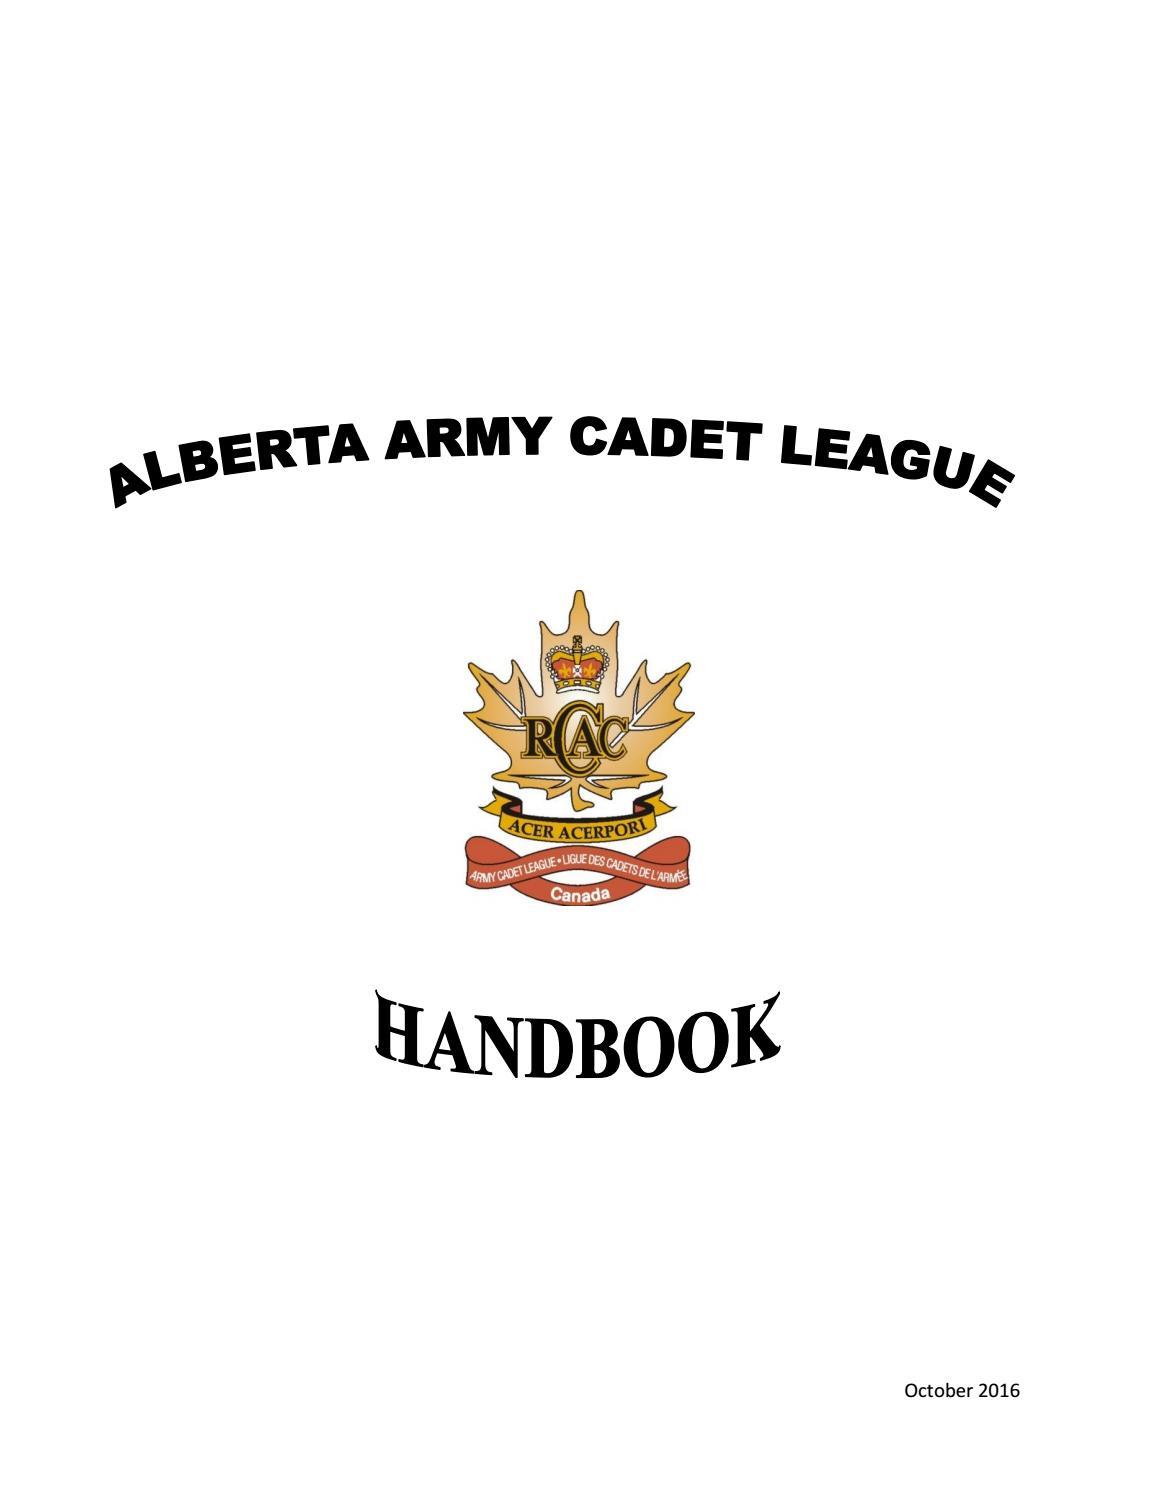 Alberta Army Cadet League Handbook by Alberta Army Cadet